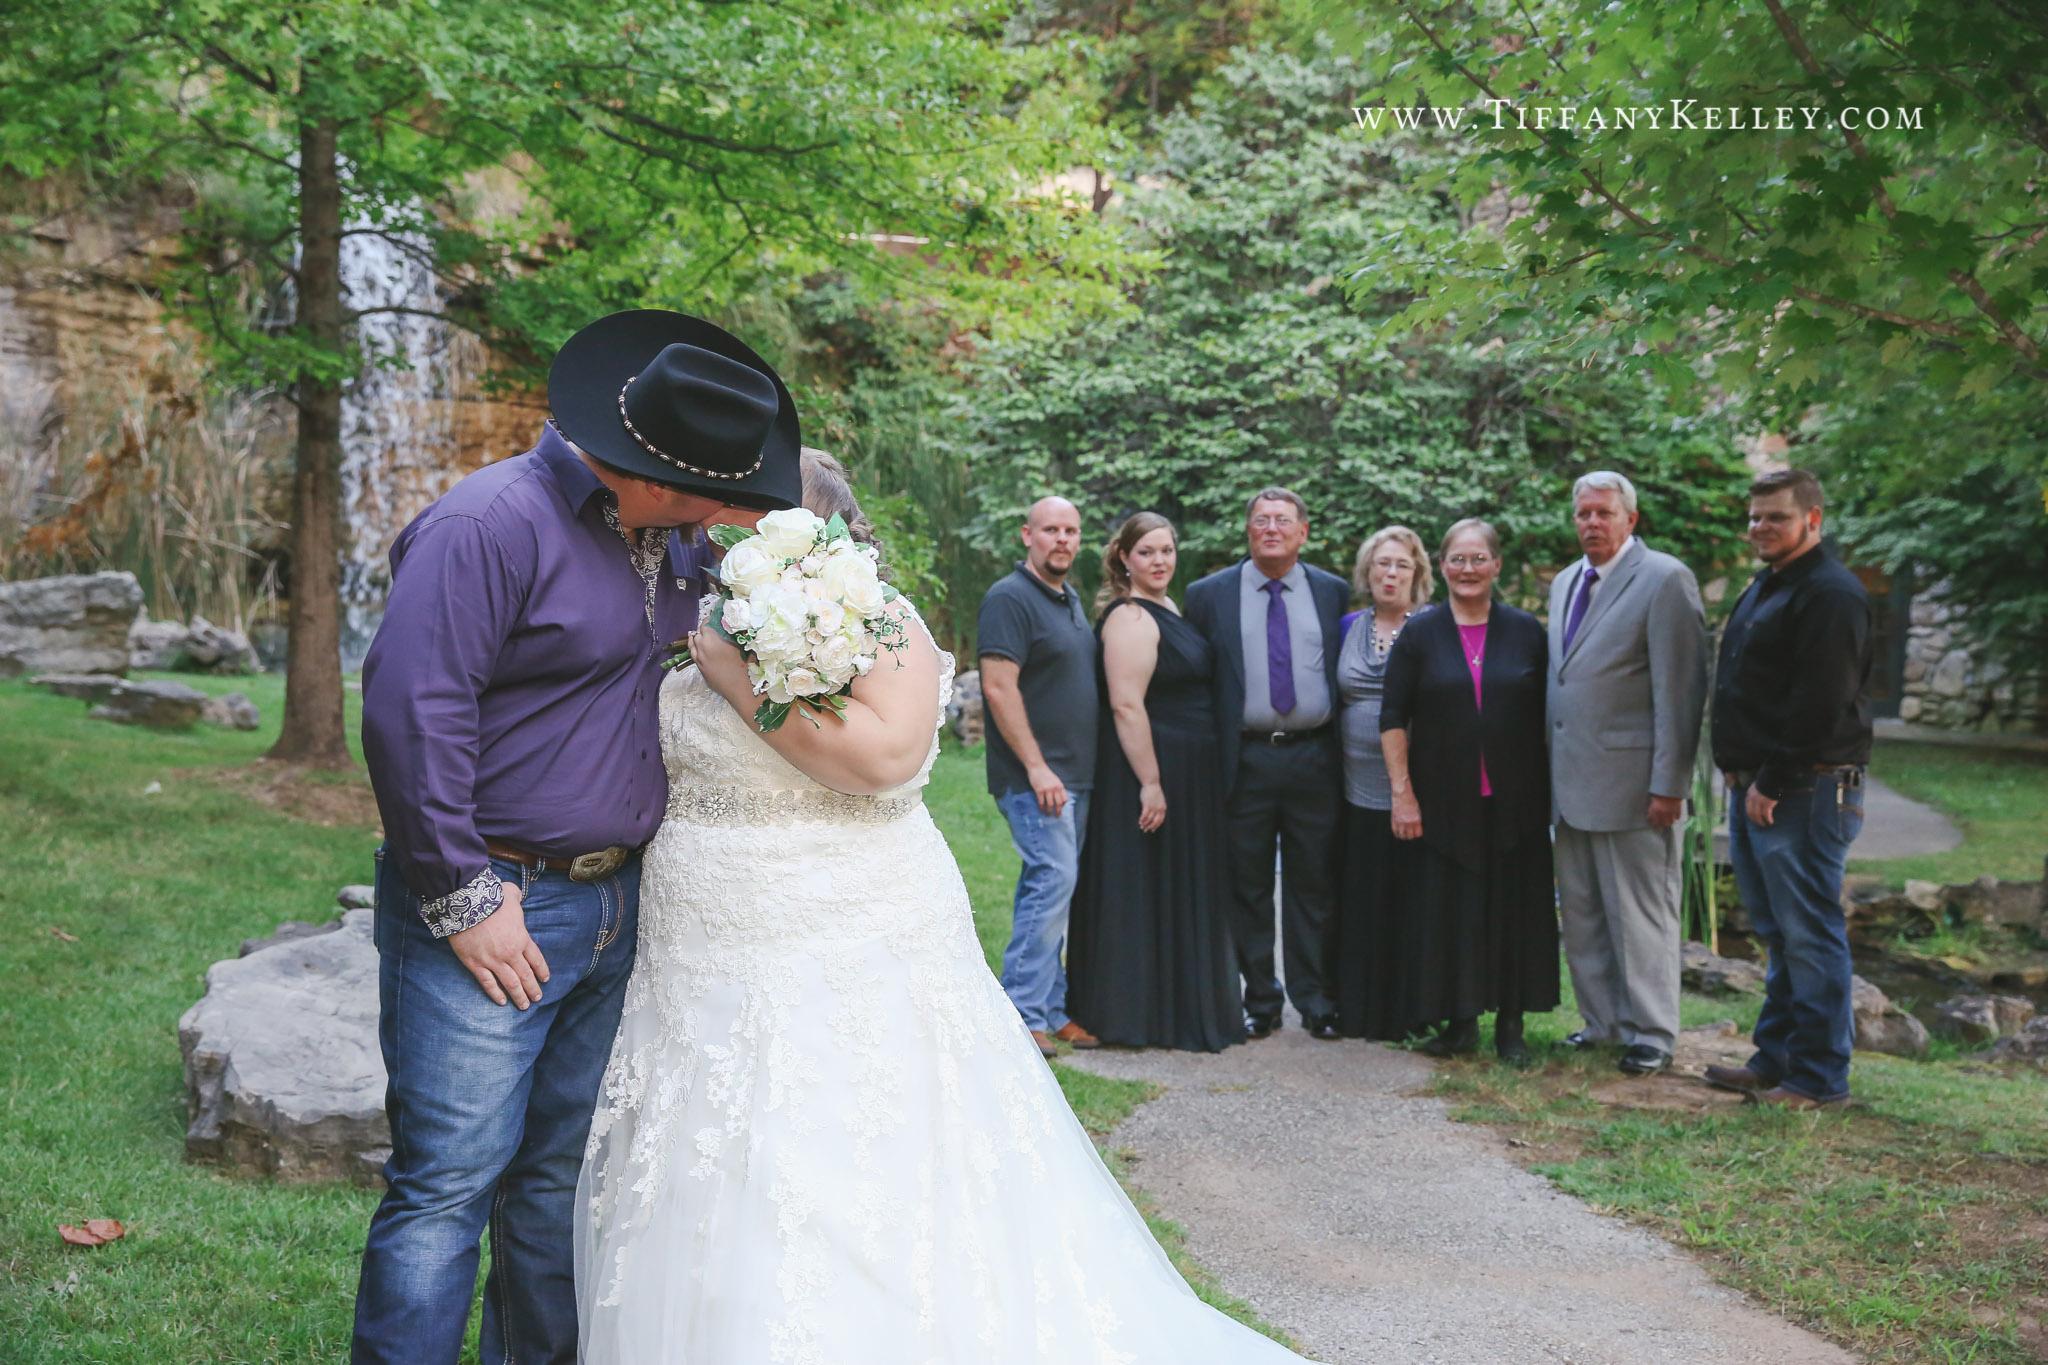 branson-missouri-big-cedar-lodge-wedding-photographer-tiffany-kelley-photography-12